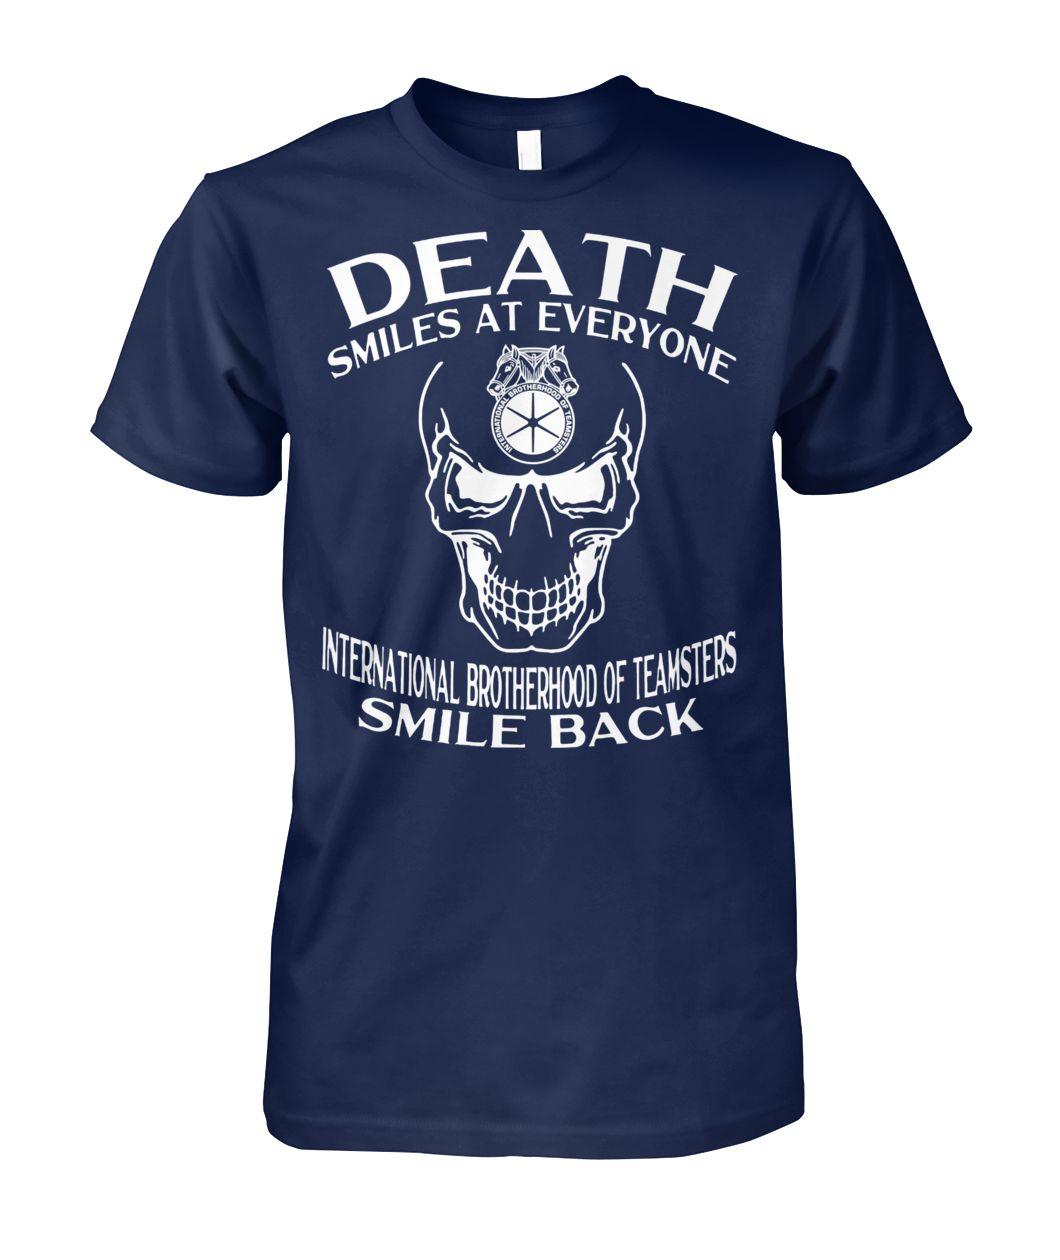 Skull death smiles at everyone international brotherhood of teamsters smile back guy shirt